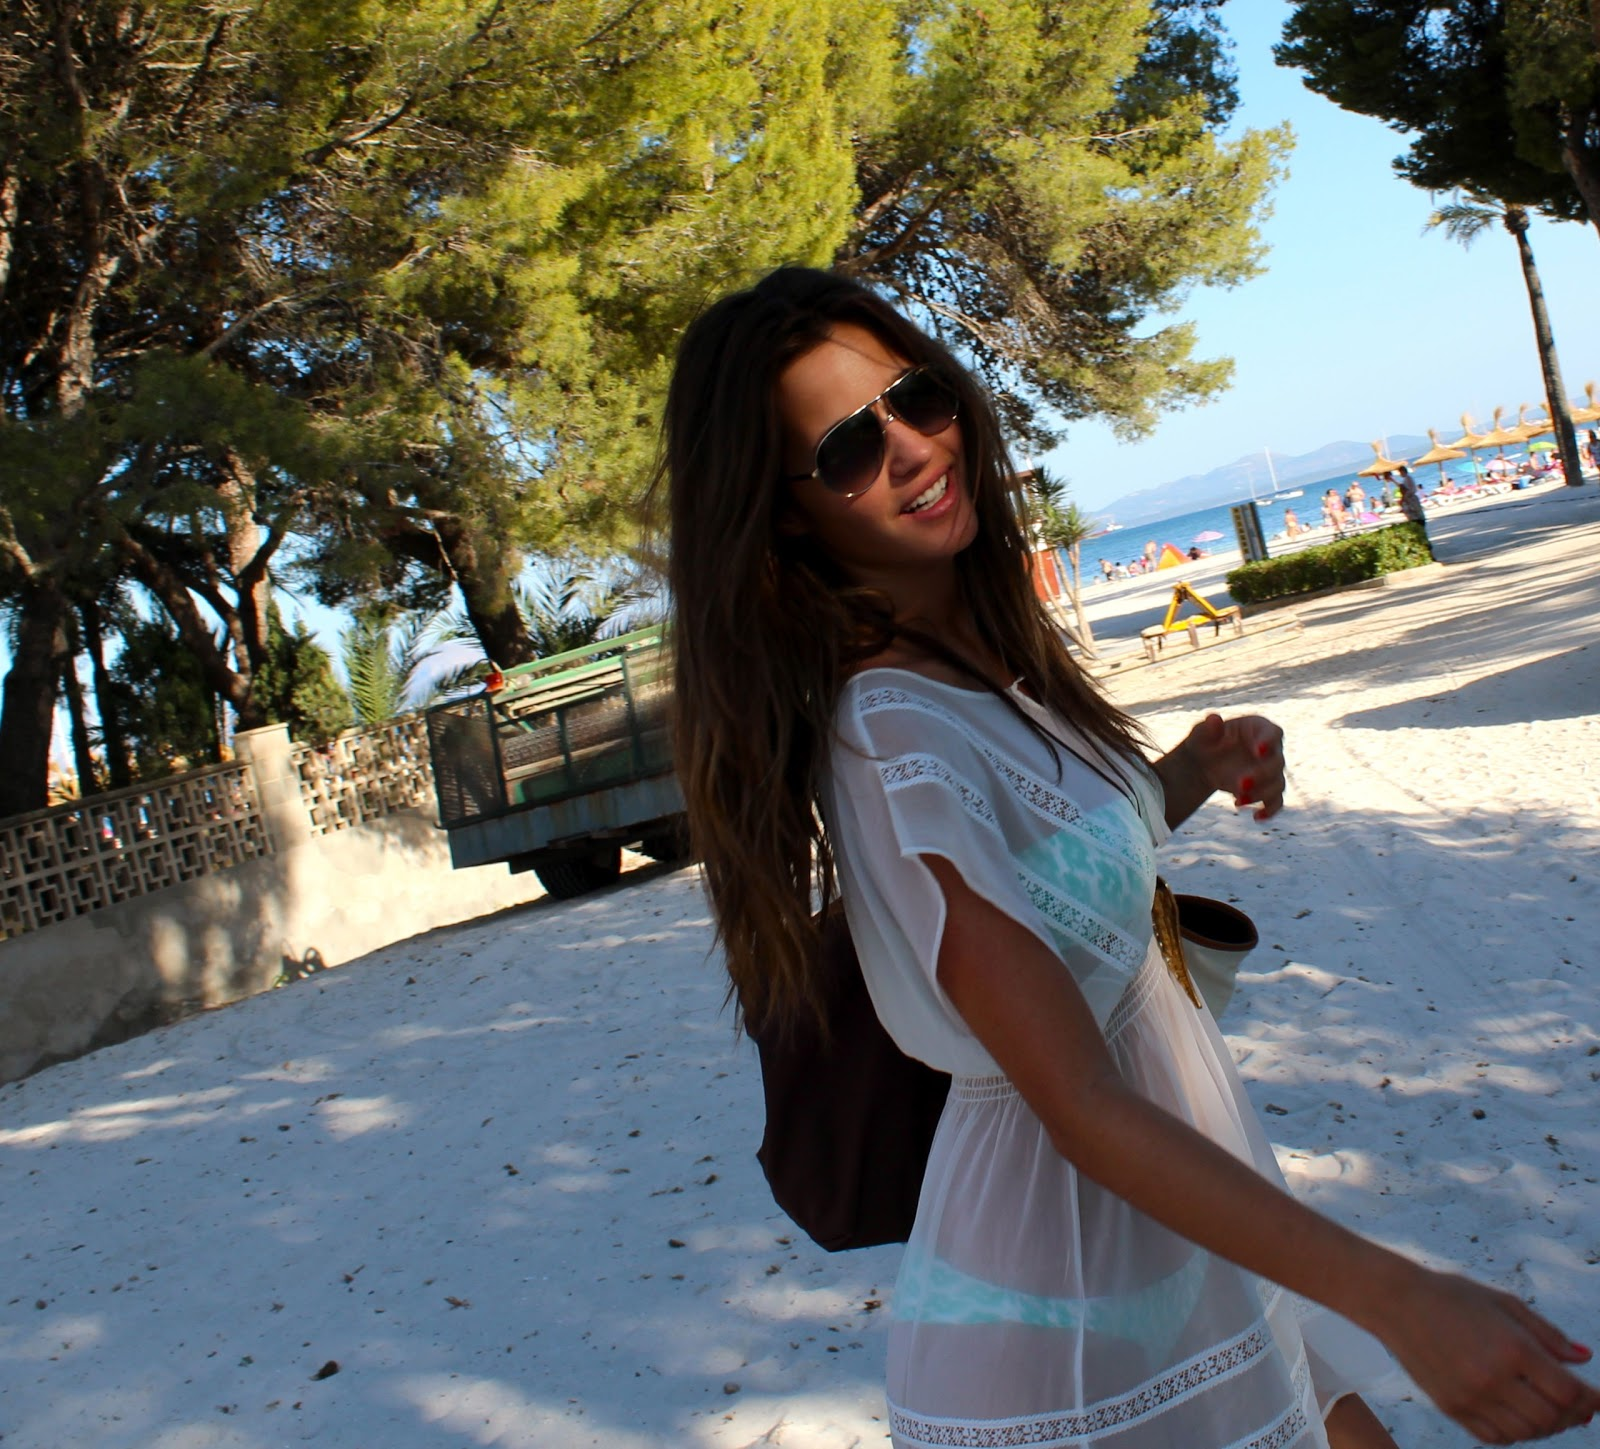 ICloud Malena Costa Sjogren nudes (39 photo), Sexy, Leaked, Boobs, braless 2015